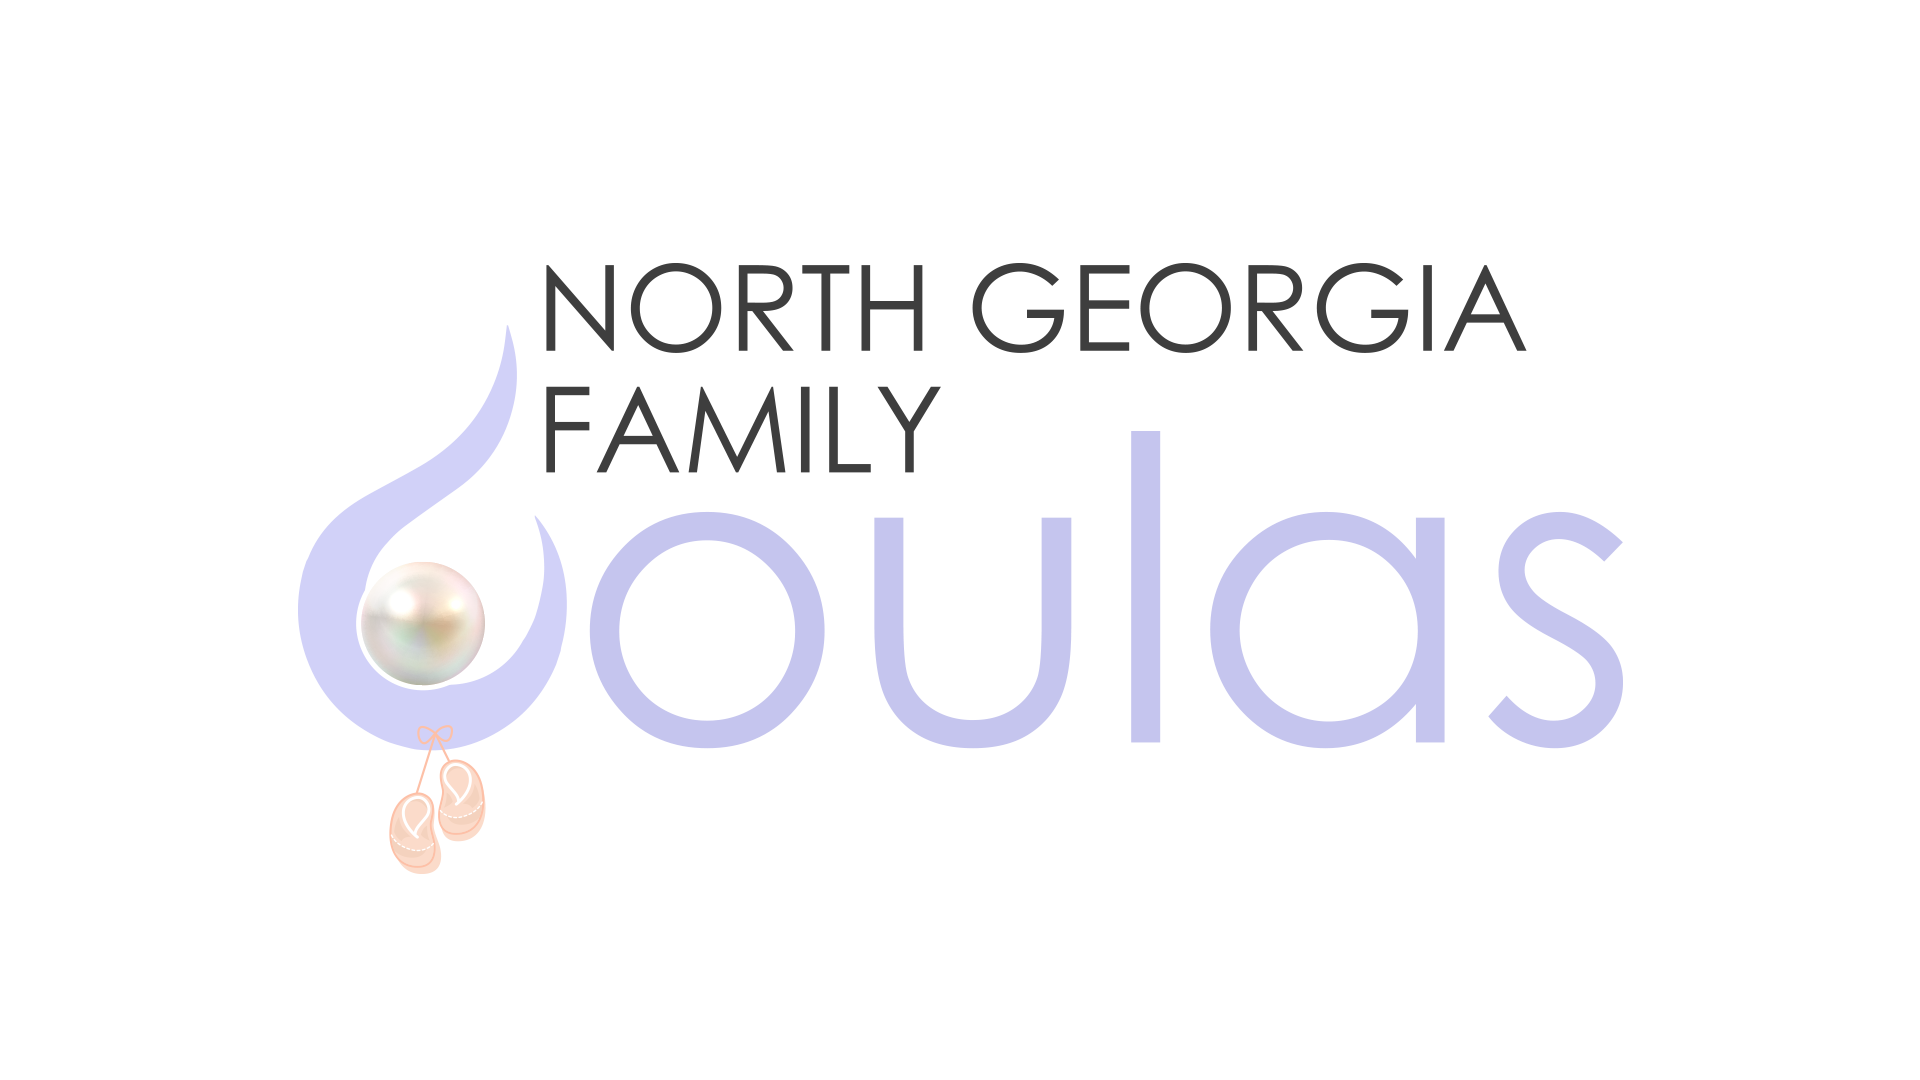 North Georgia Family Doulas